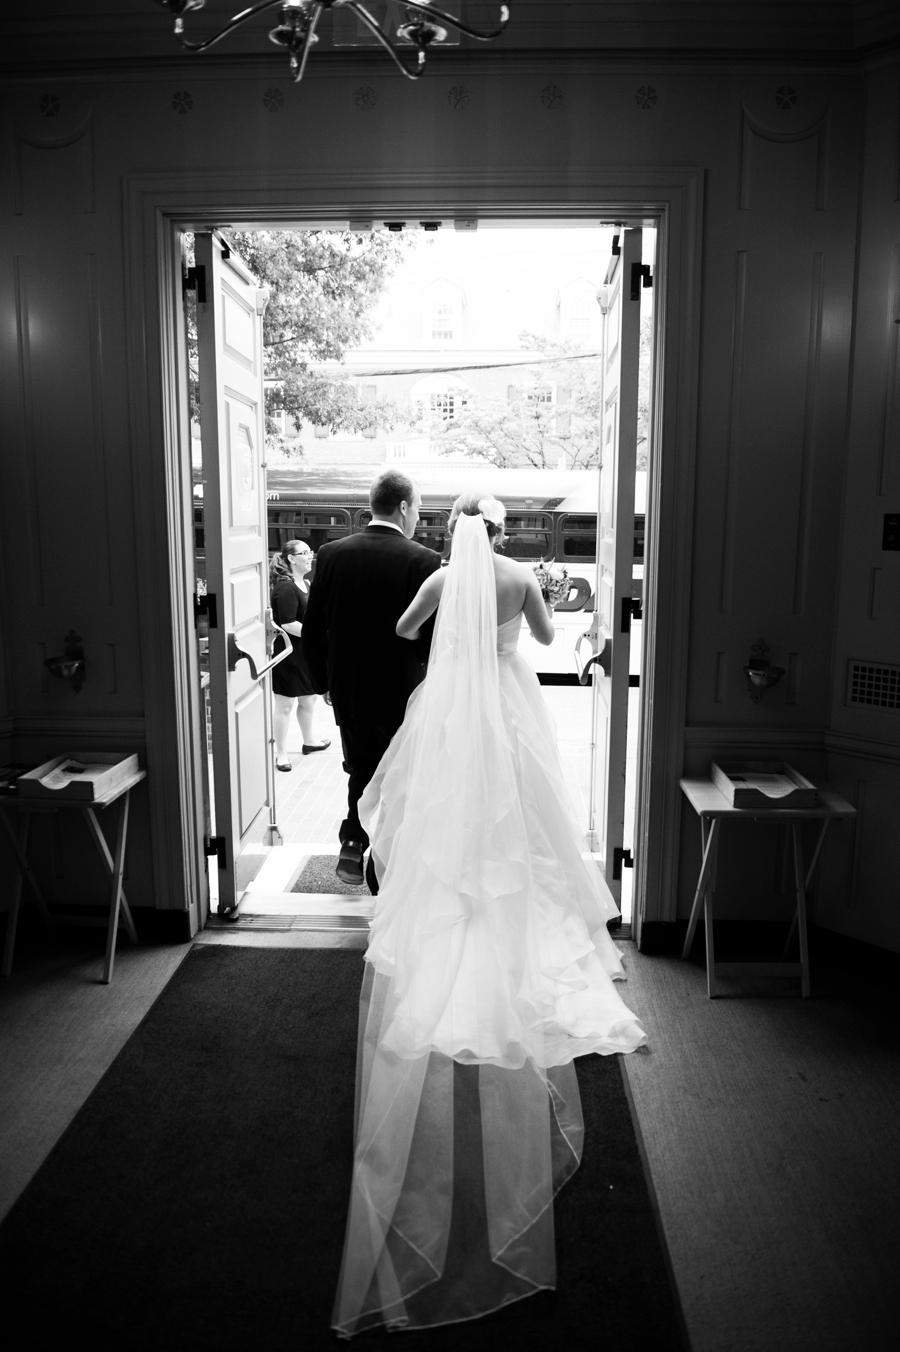 New_Haven_Lawn_Club_CT_Wedding_JI_029.jpg